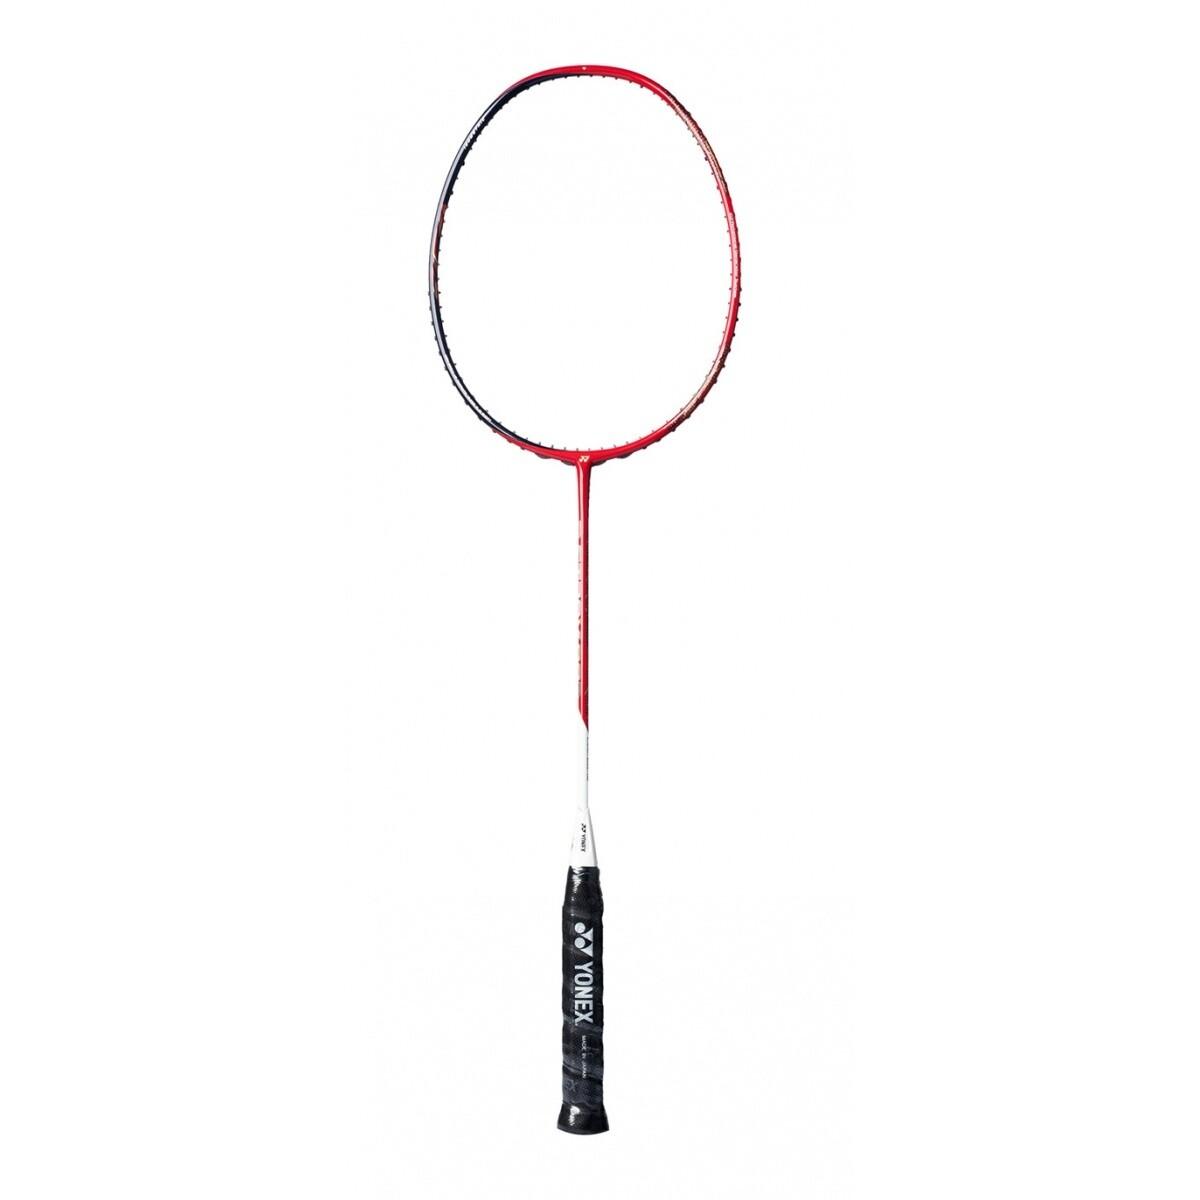 Yonex Astrox 88 D (Dominate) Badminton Racket